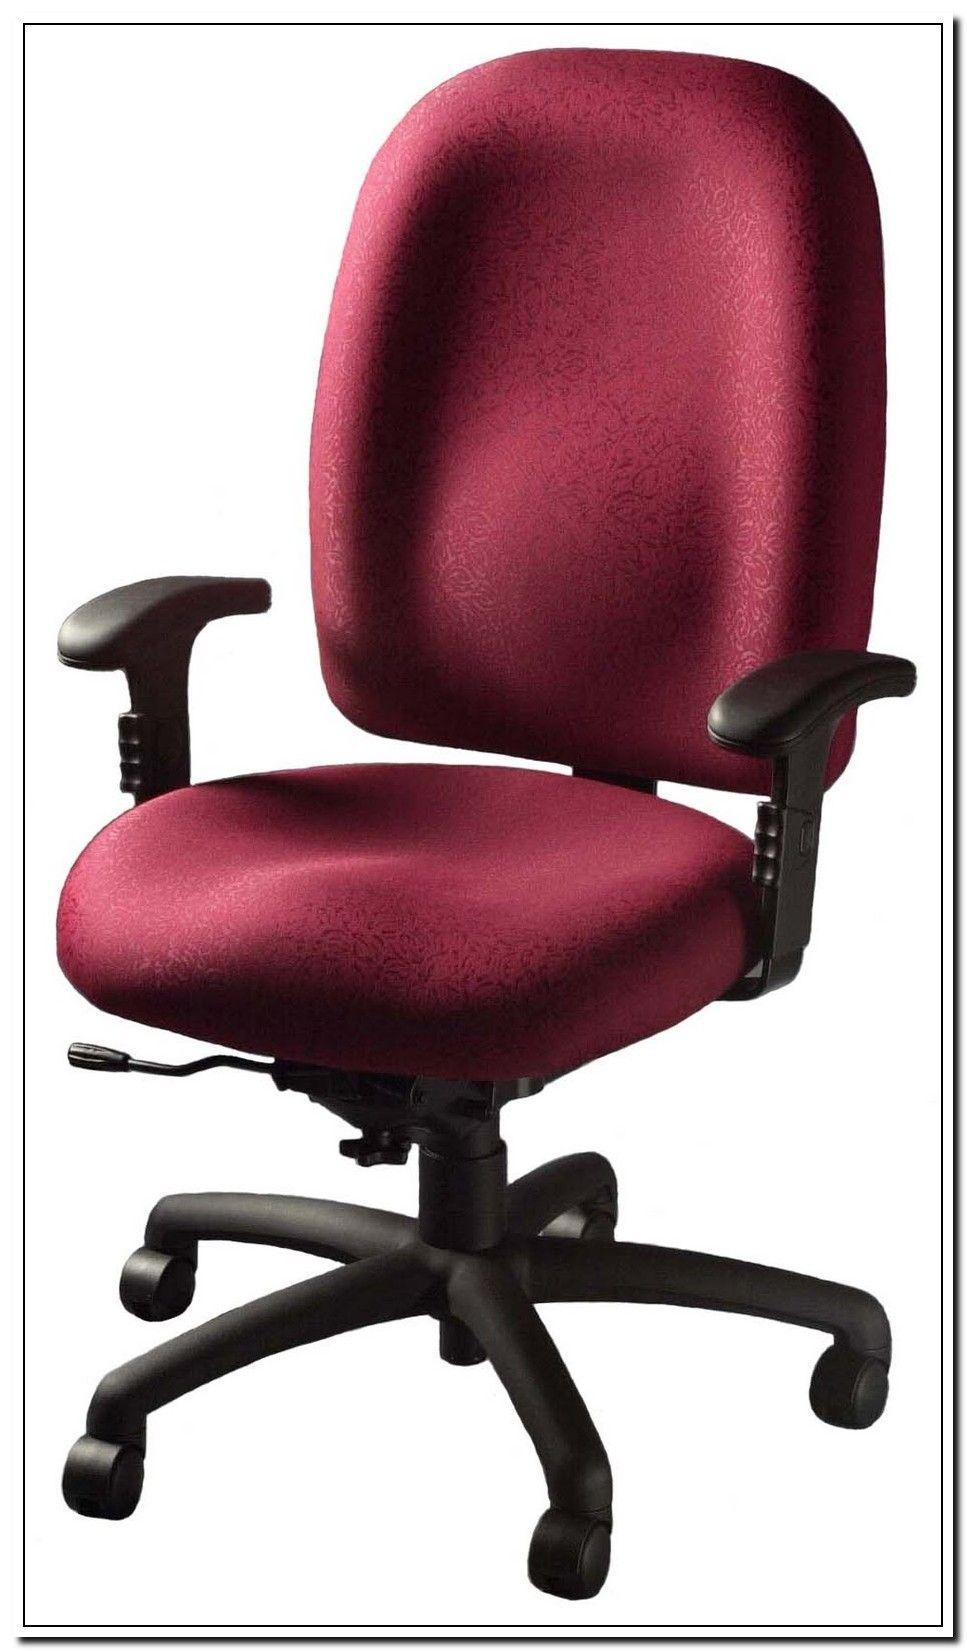 84 Reference Of Ergonomic Desk Chair Reddit In 2020 Best Office Chair Modern Home Office Furniture Ergonomic Desk Chair